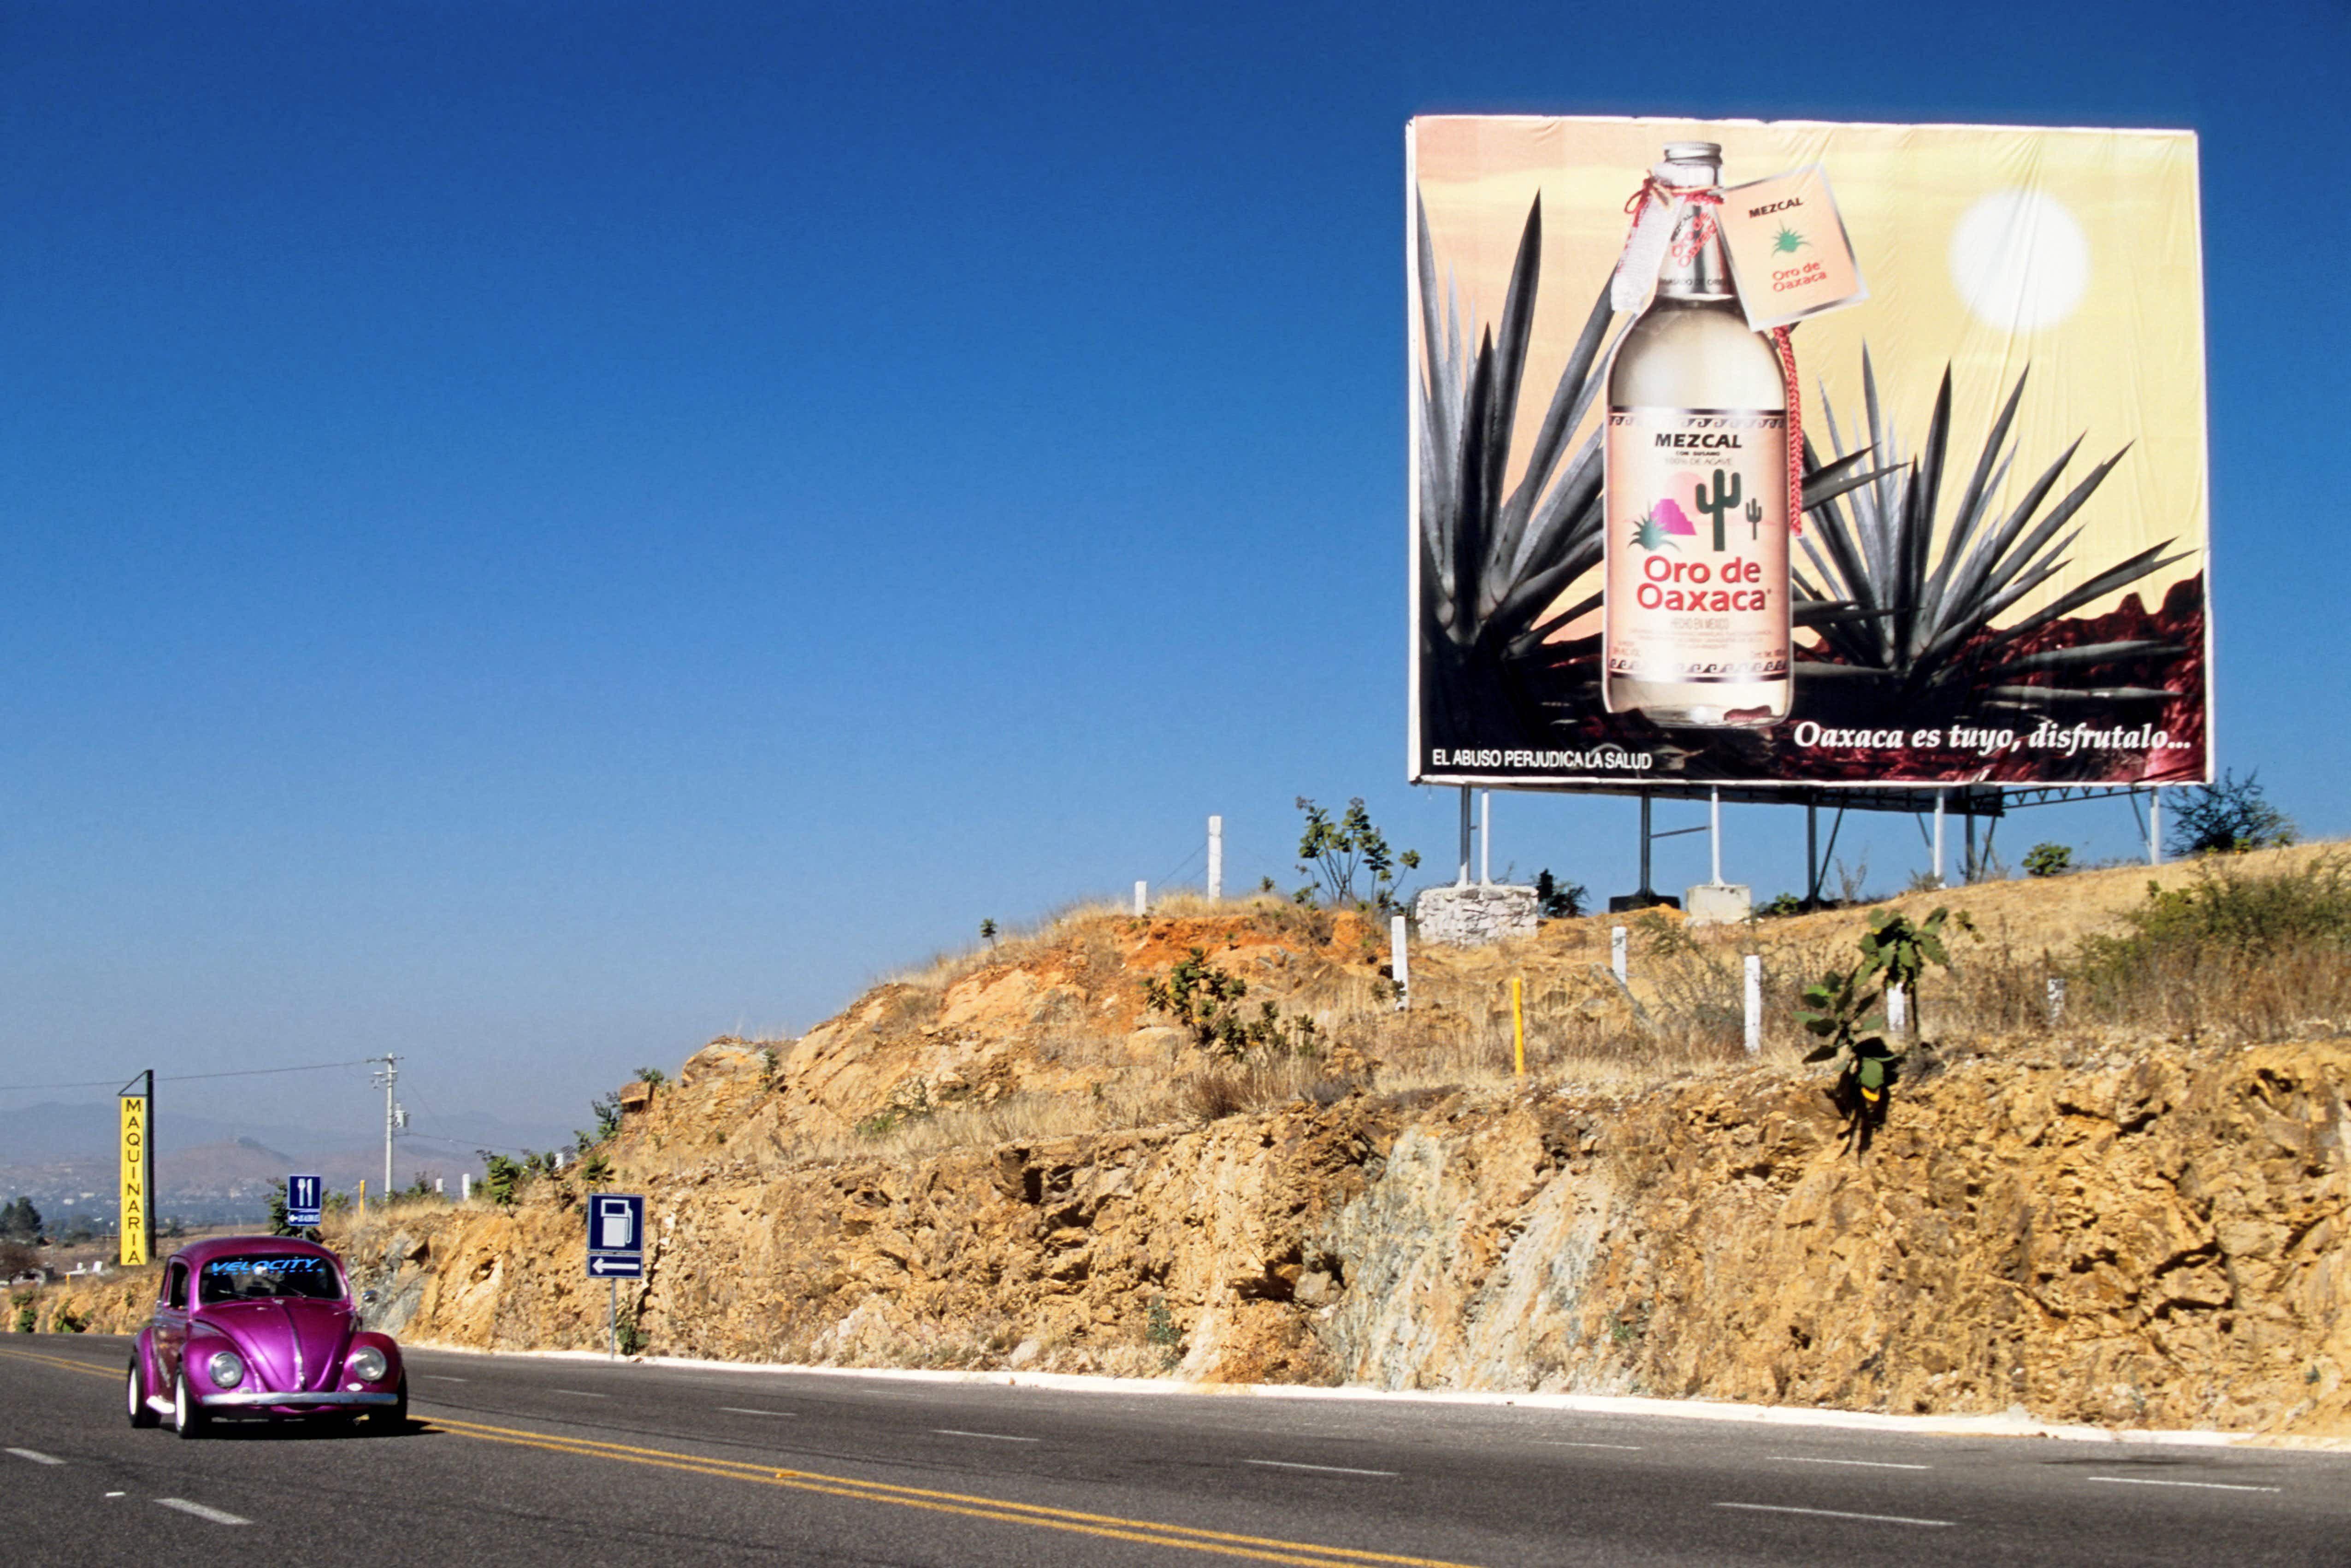 Mezcal three ways: ten great places to get mezcal in Oaxaca